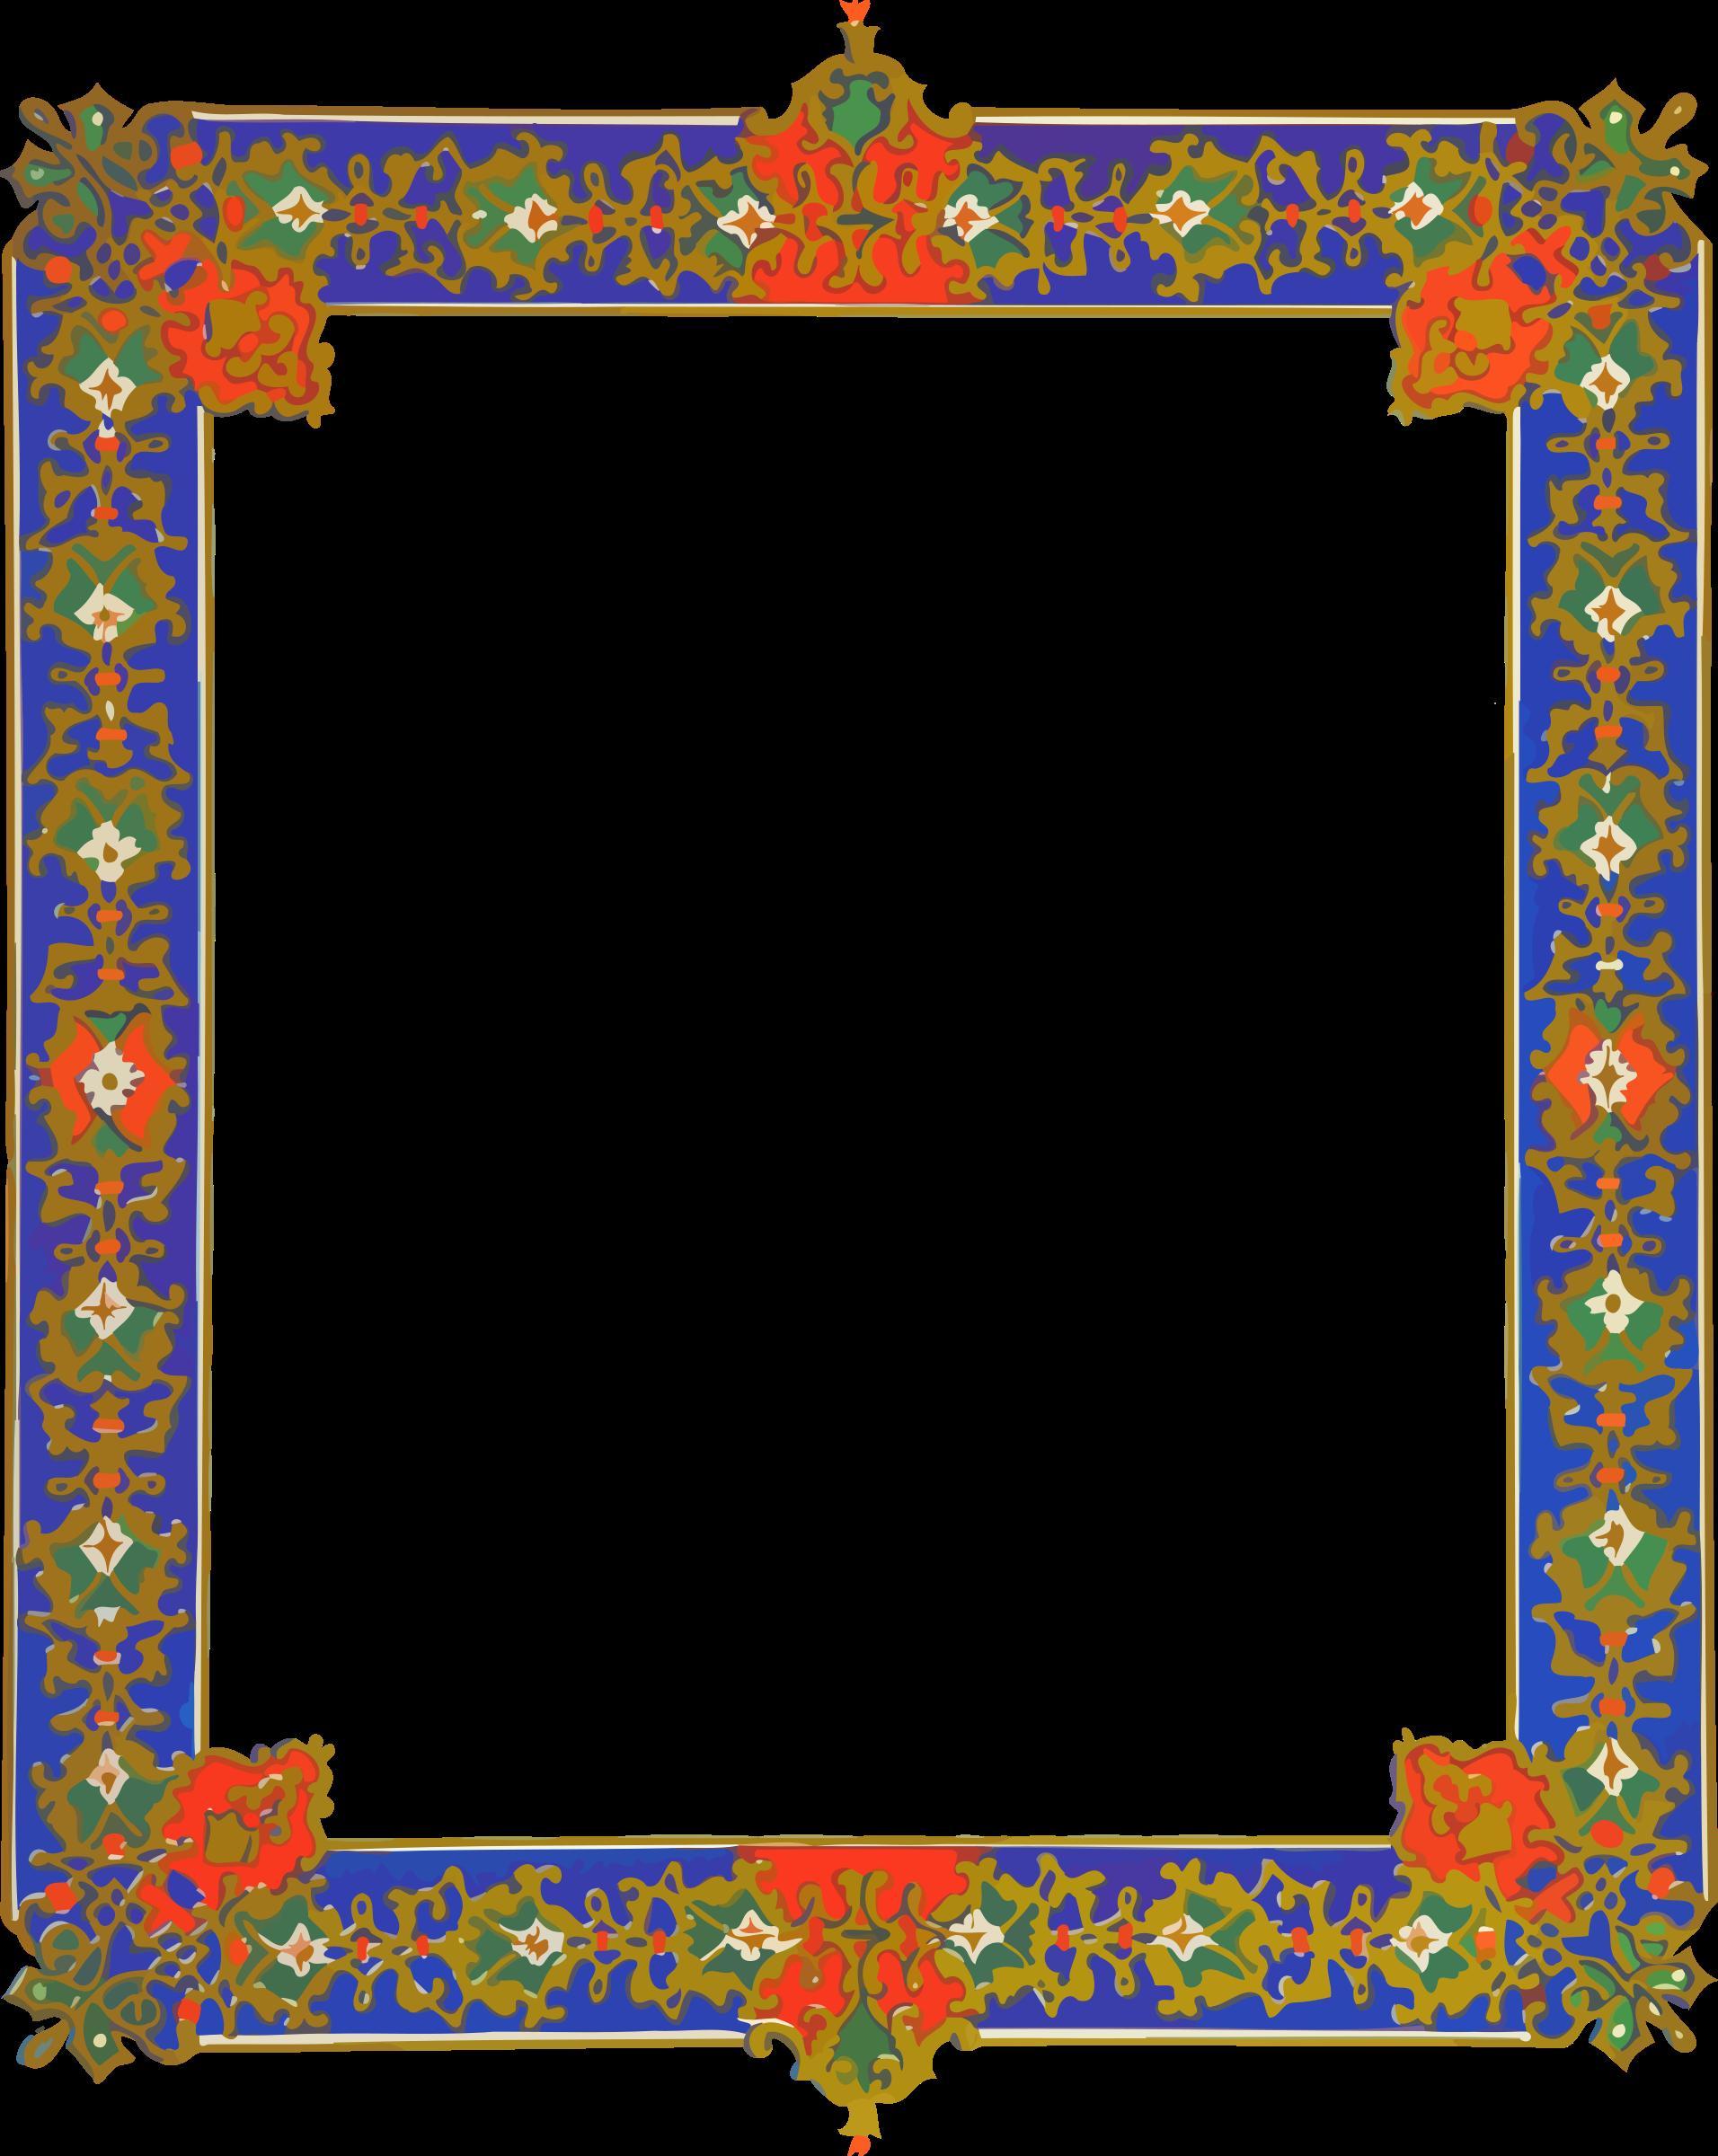 Marbles clipart name. Ornate frame big image